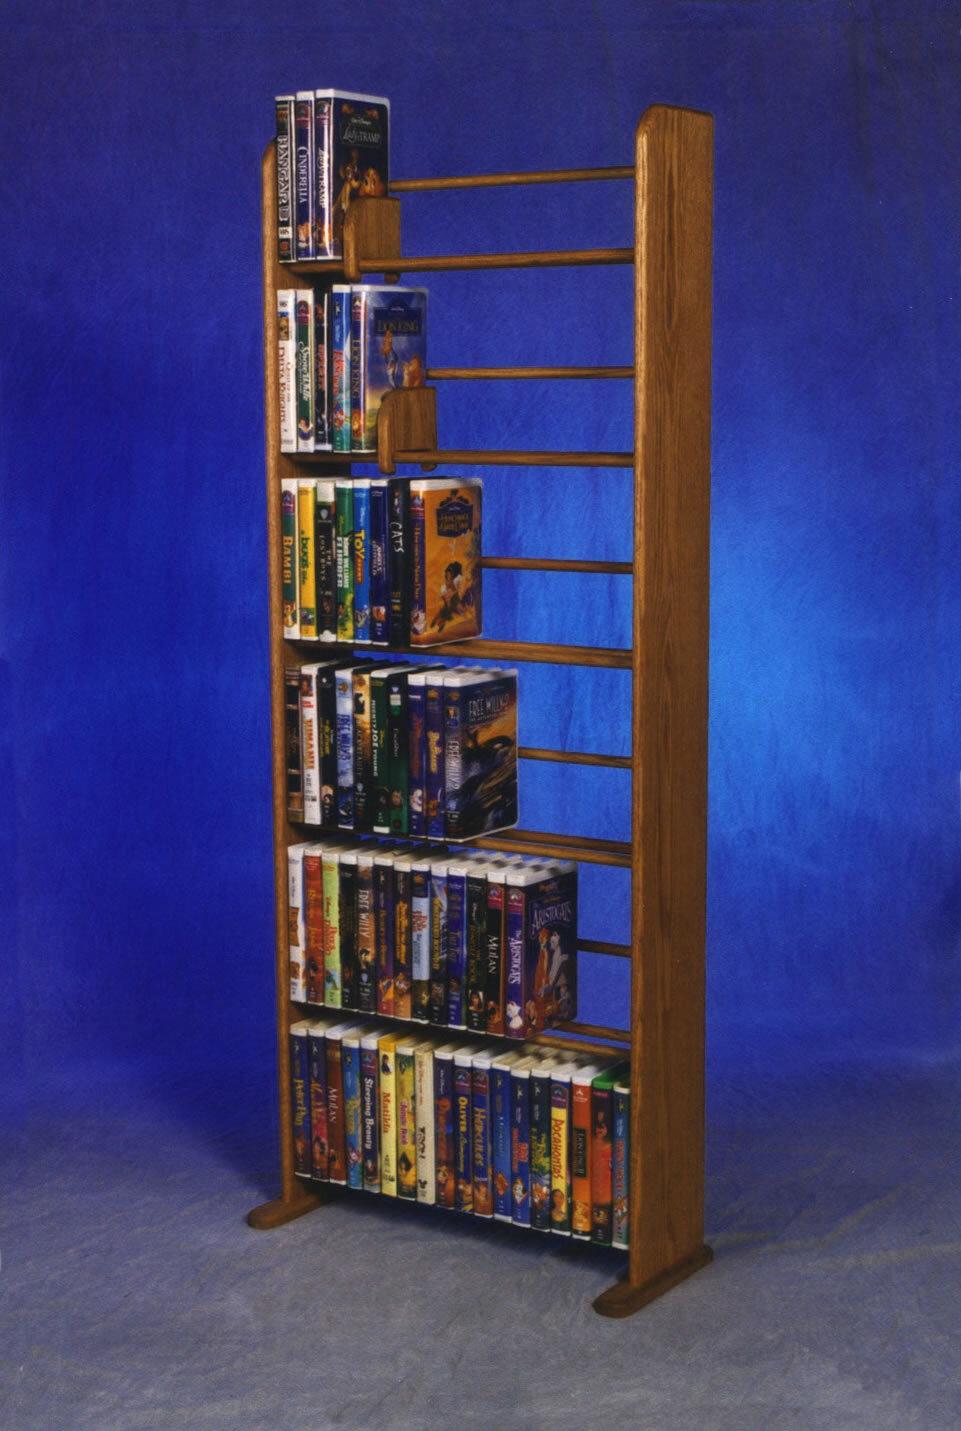 Wood Shed Delux VHS Dowel Multimedia Storage Rack